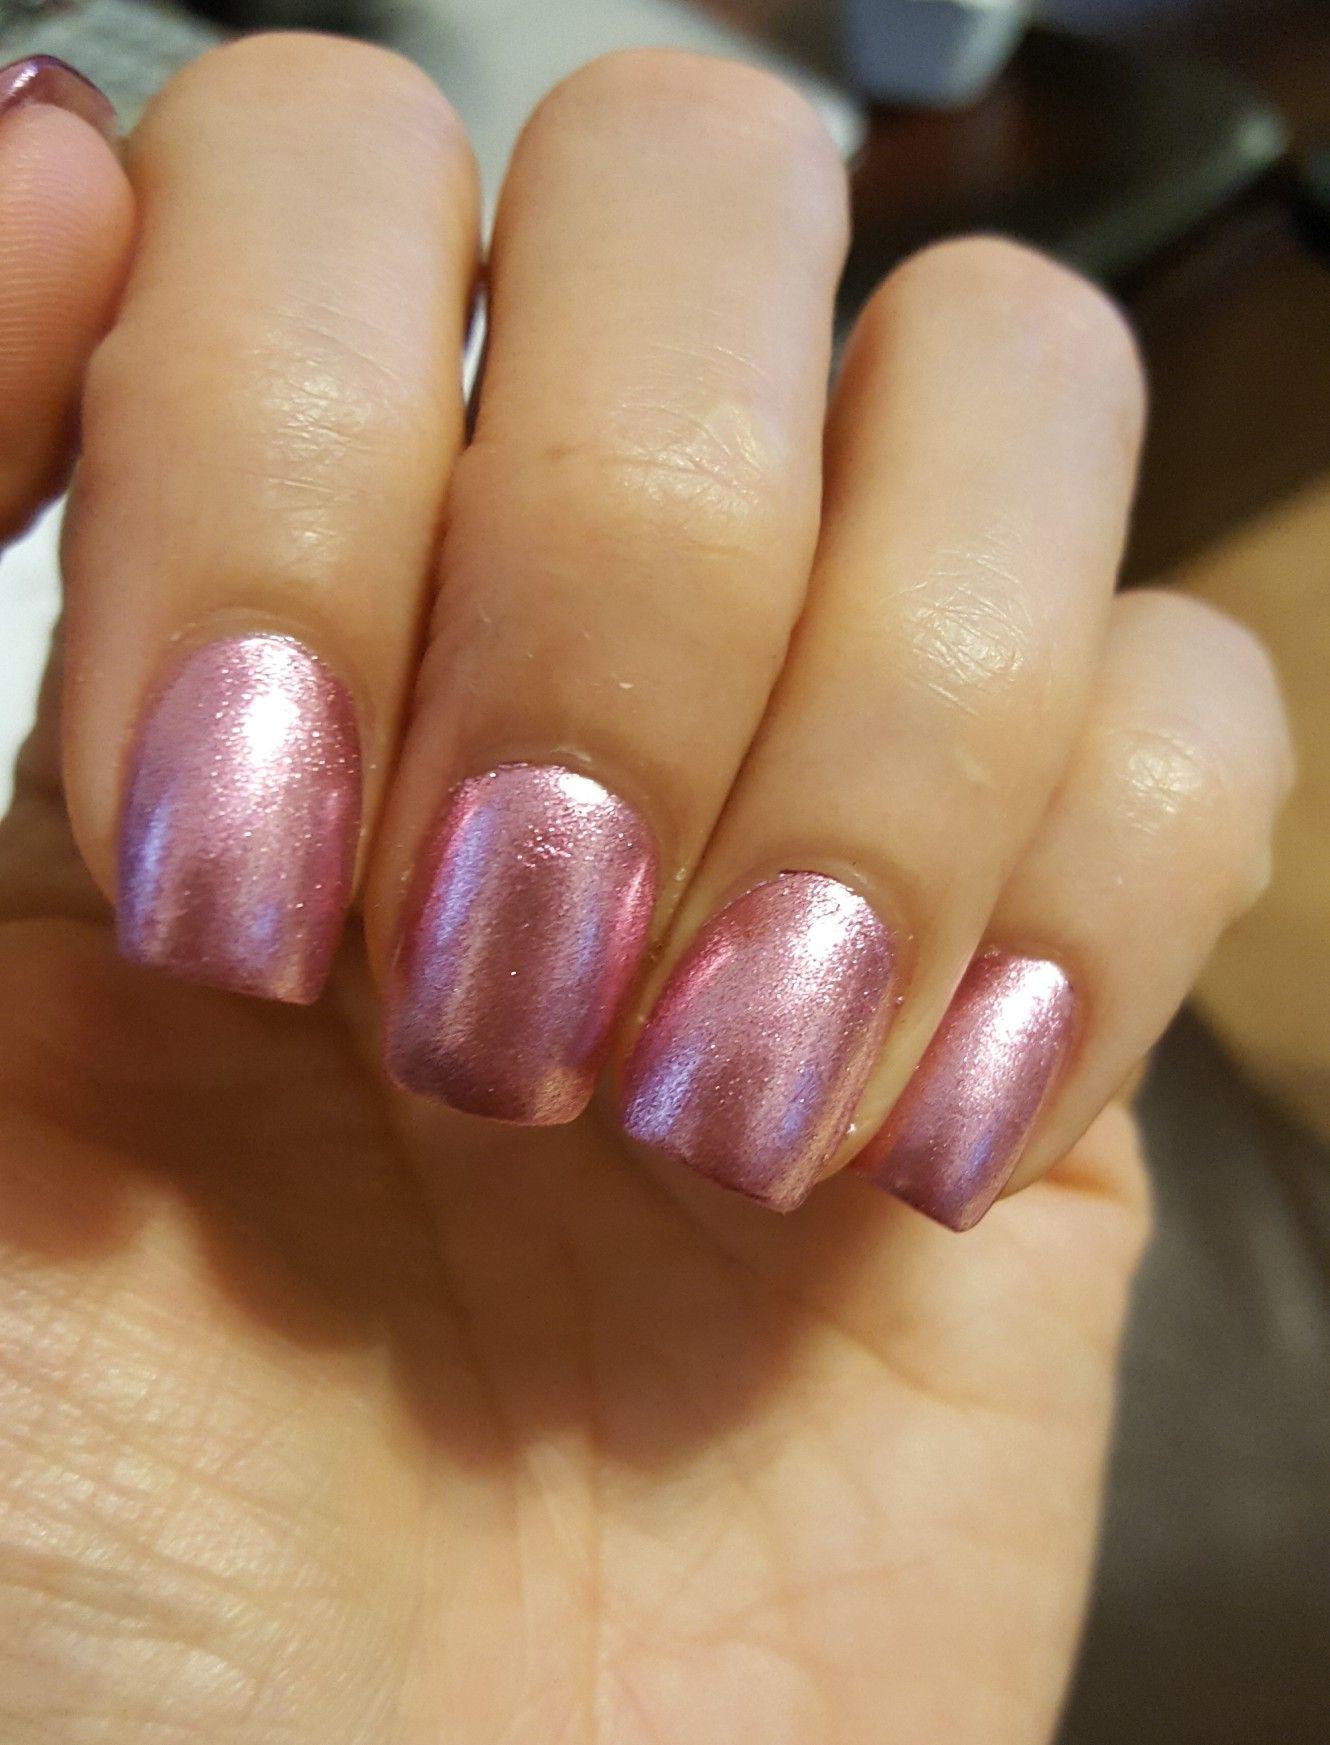 BSN nail polish Silk Shine, metallic pink nails | Nails | Pinterest ...